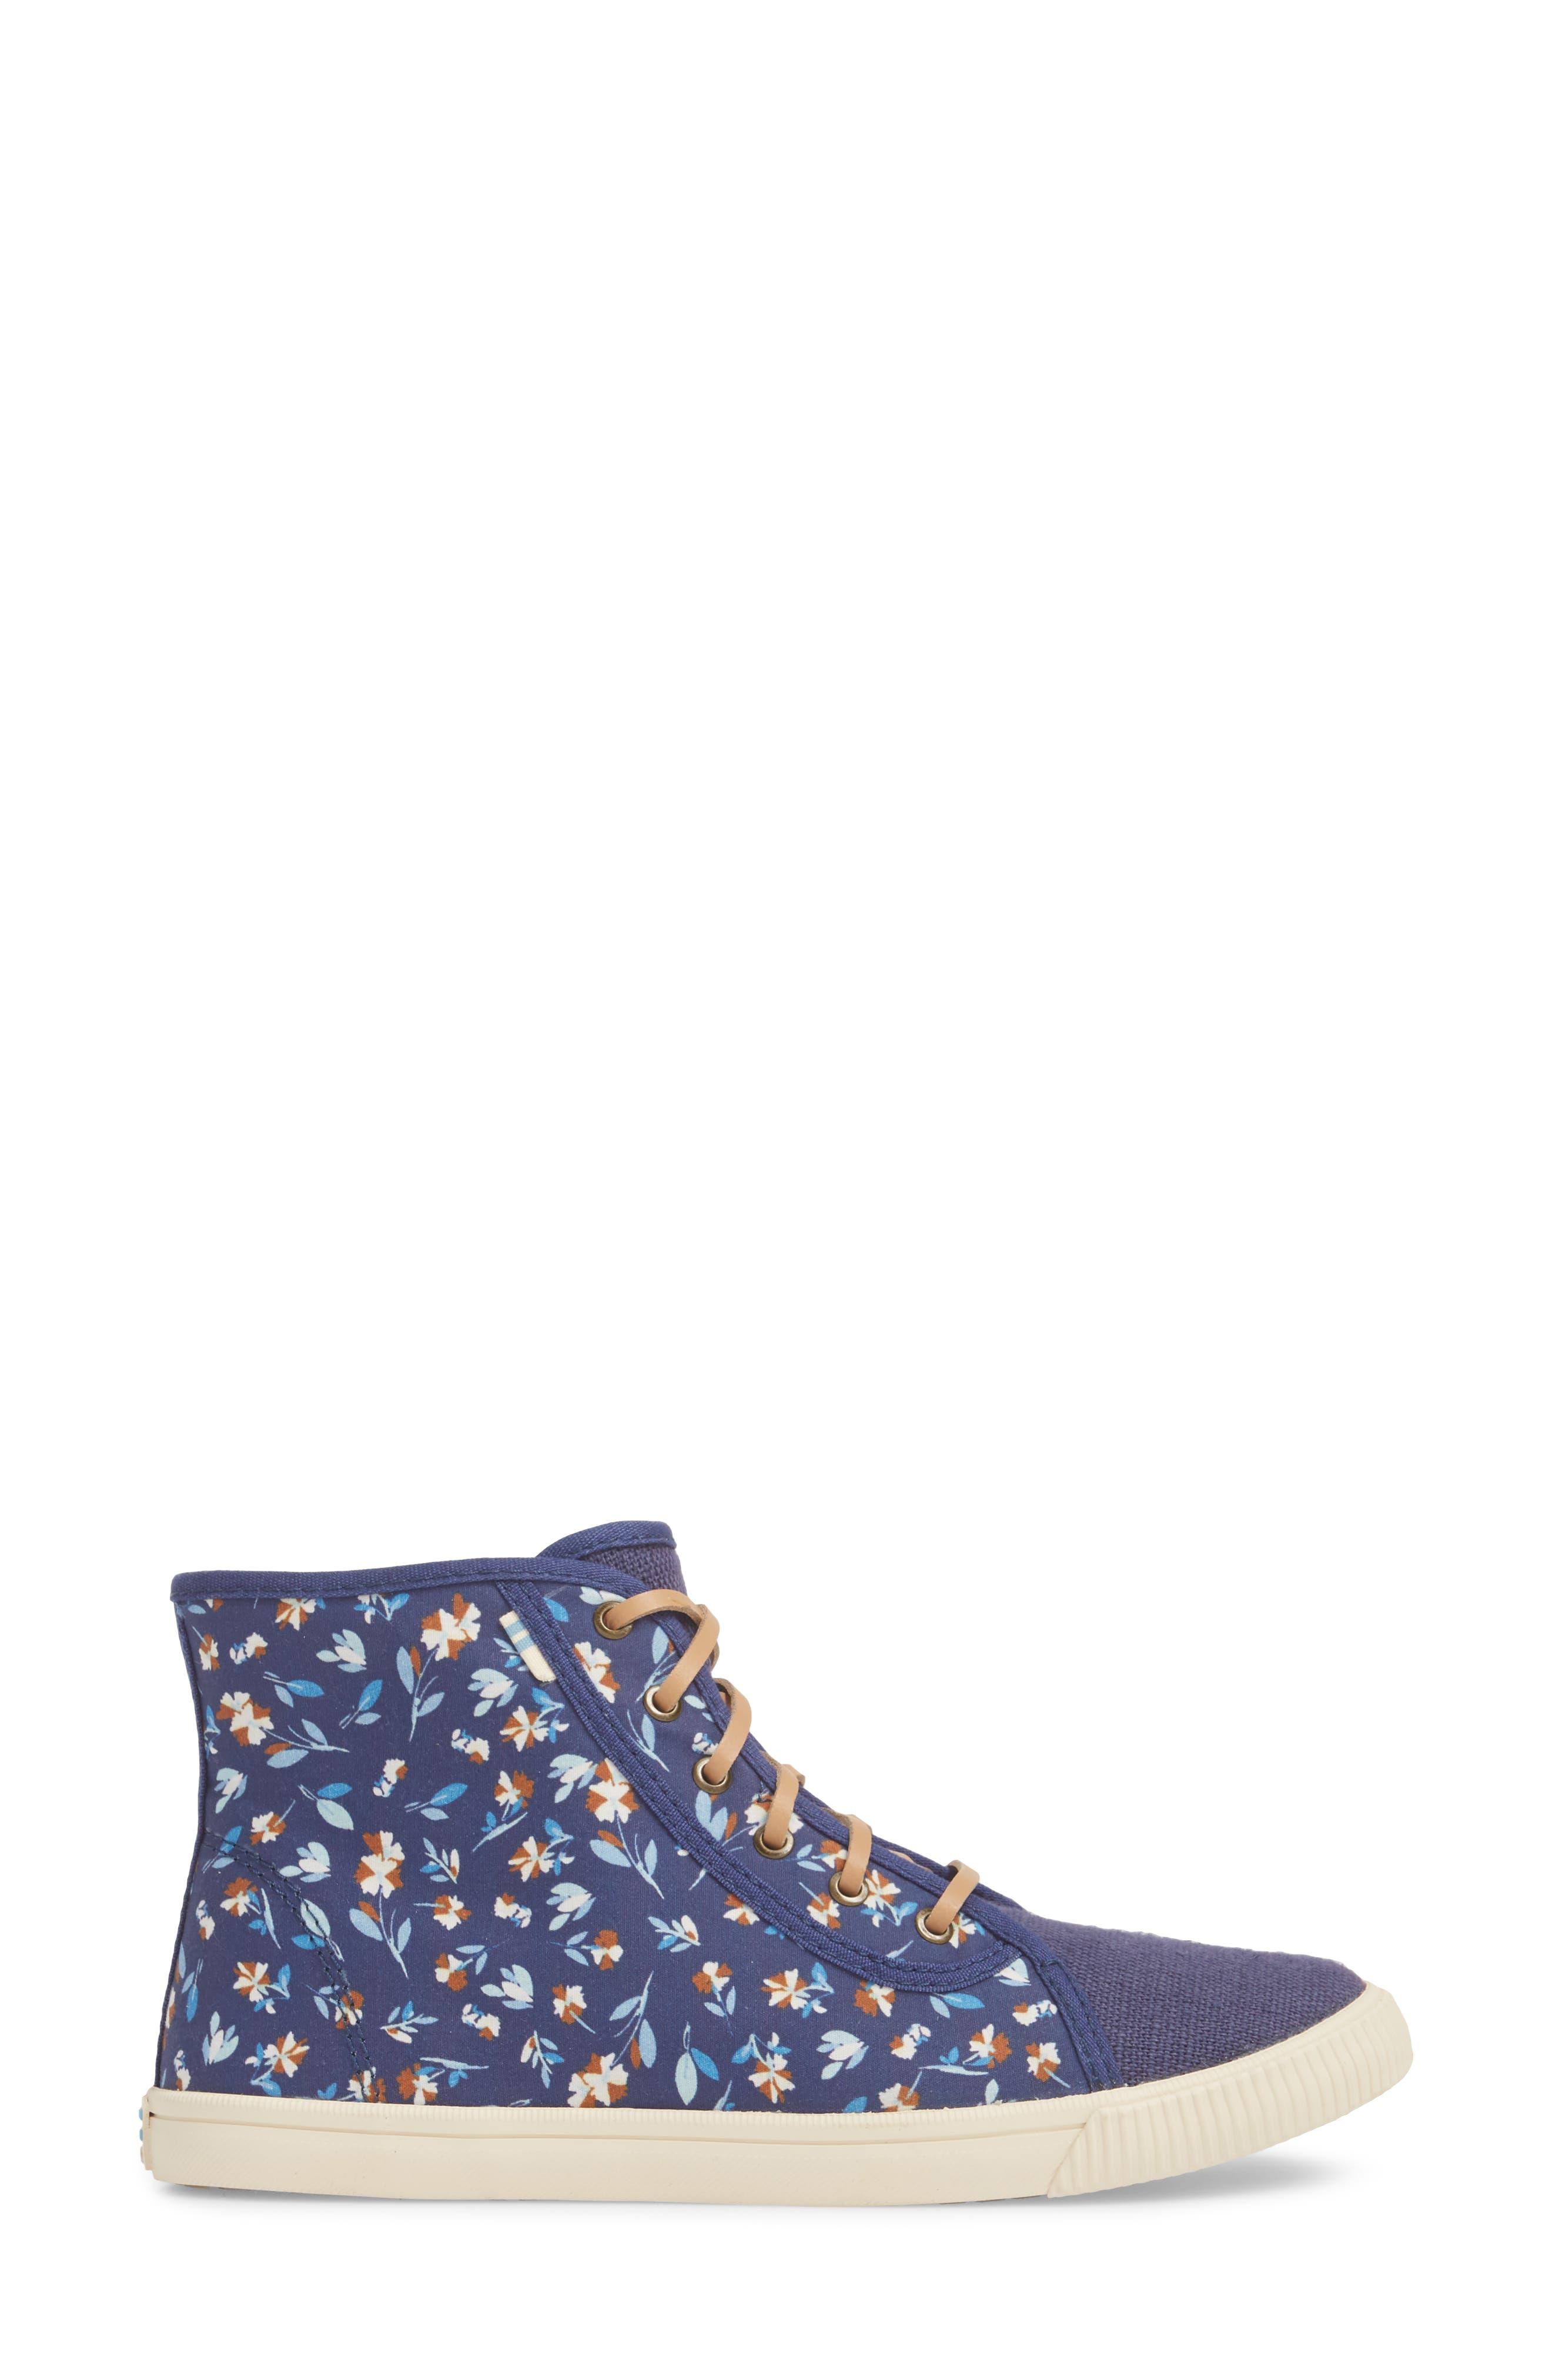 Camarillo High Top Sneaker,                             Alternate thumbnail 3, color,                             Deep Blue Vintage Flower